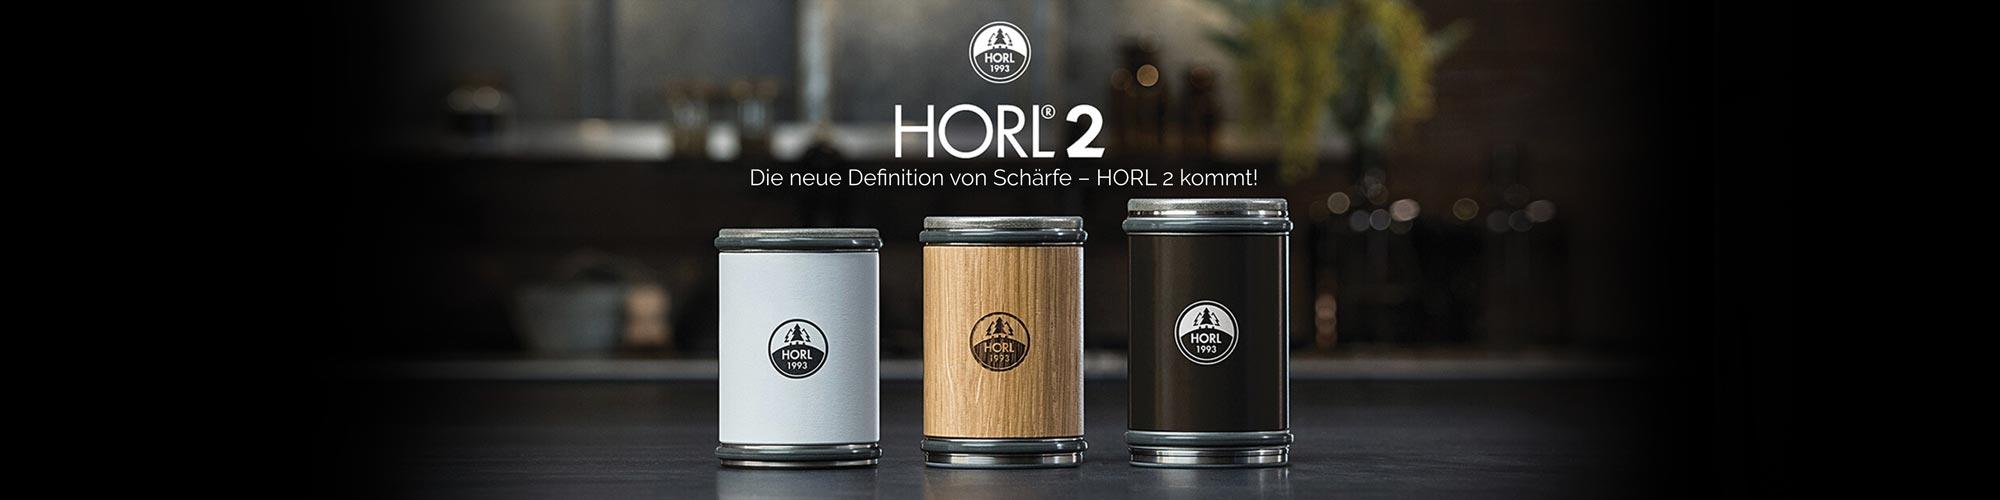 Horl Messerschleifer